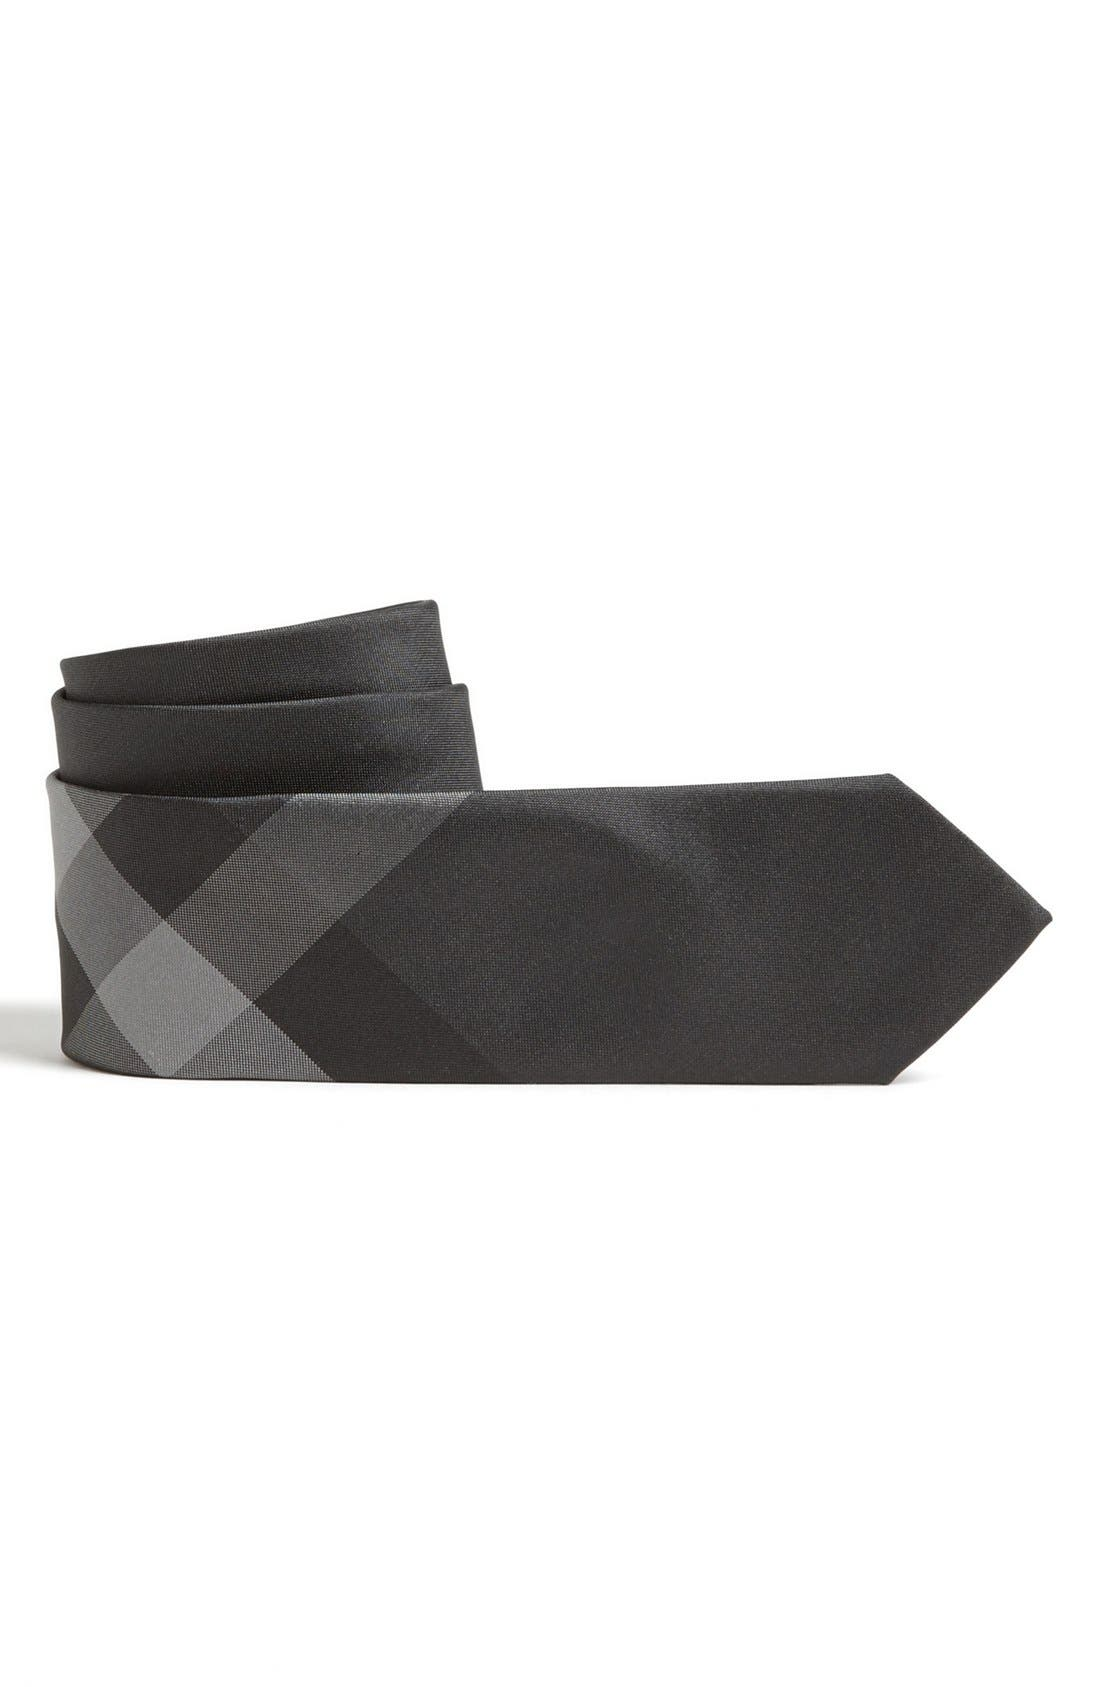 Alternate Image 1 Selected - Burberry Woven Silk Tie (Big Boys)